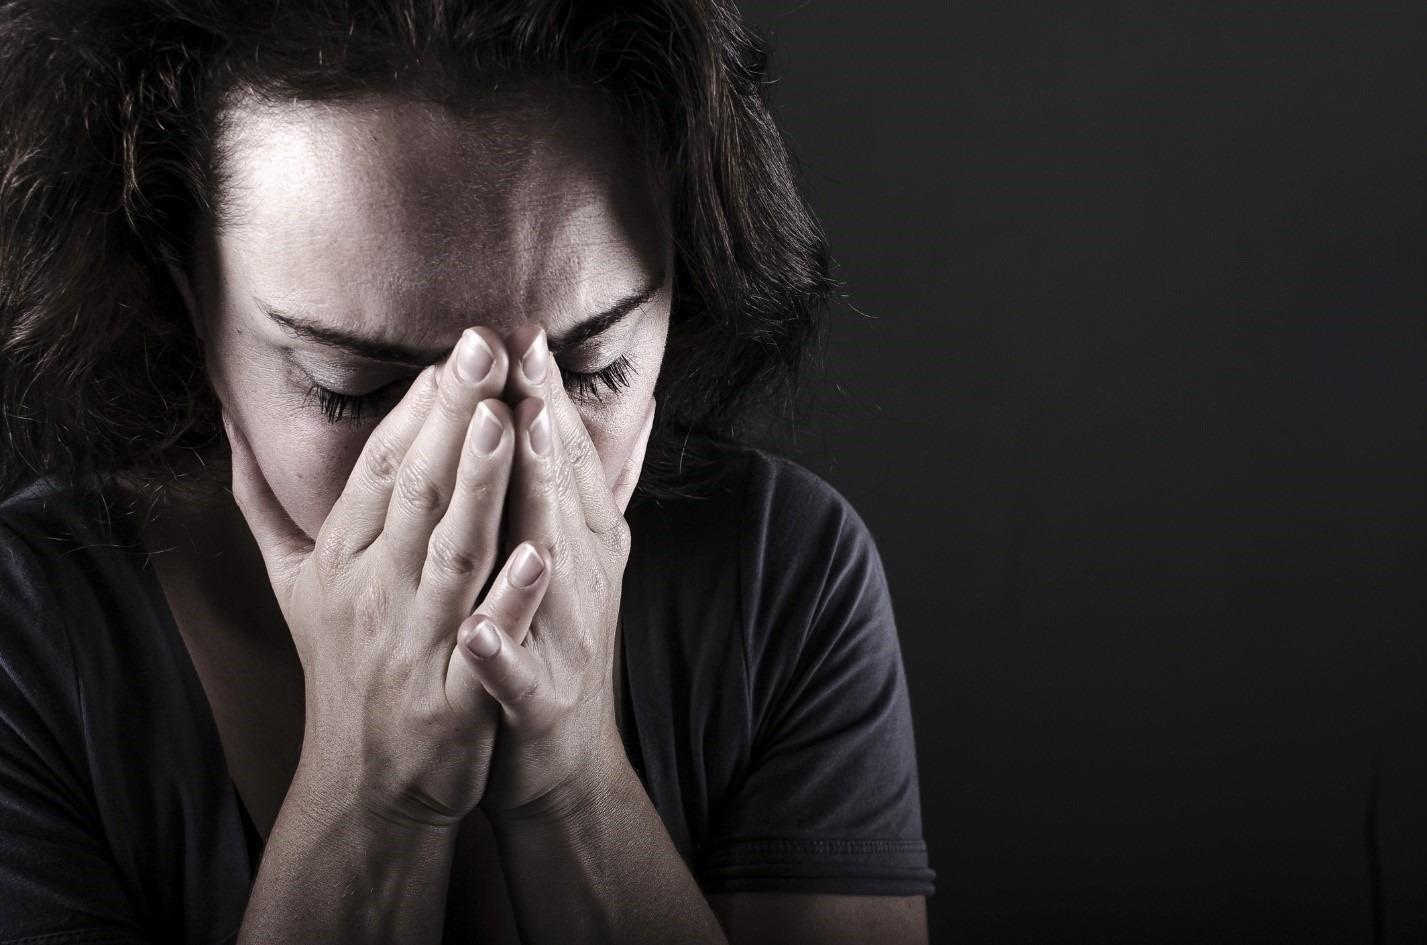 Психосоматика: влияет ли депрессия на развитие сердечно-сосудистых заболеваний?